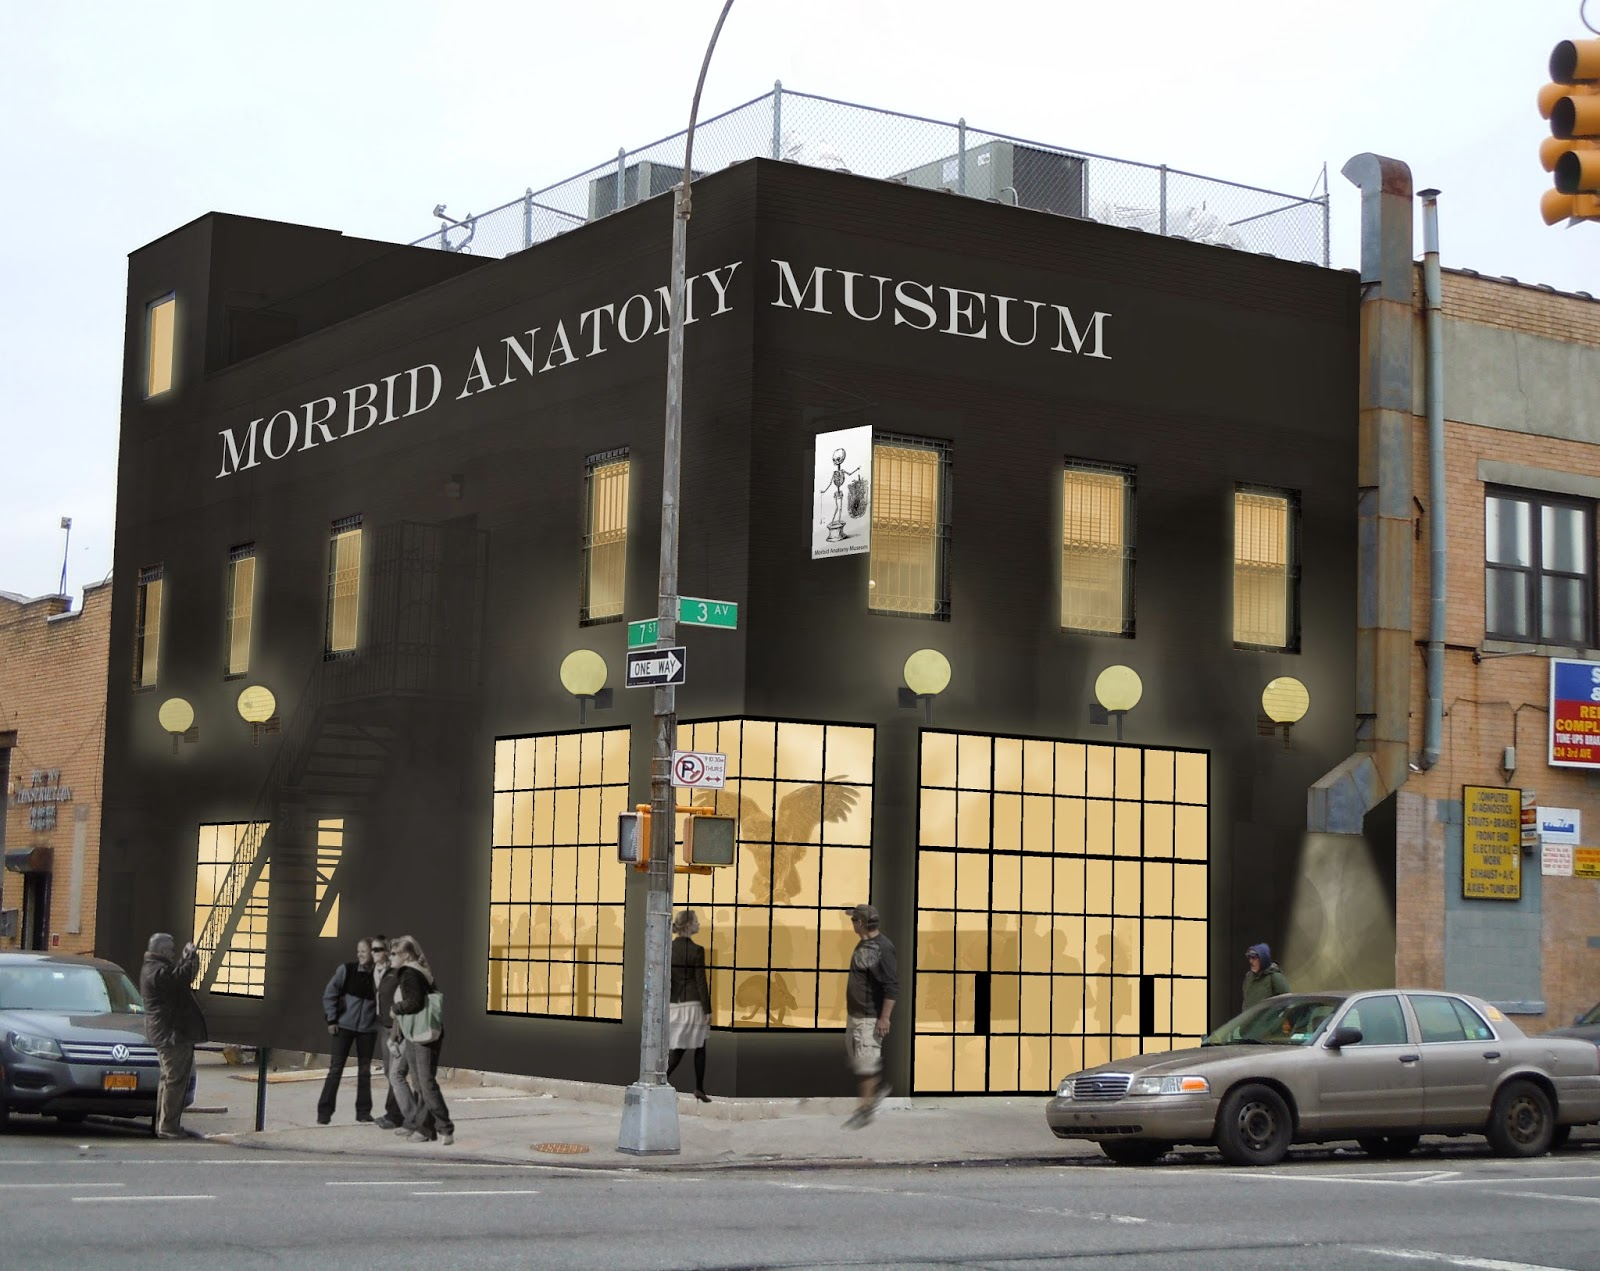 Morbid Anatomy The Morbid Anatomy Museum Is Coming Soon And It